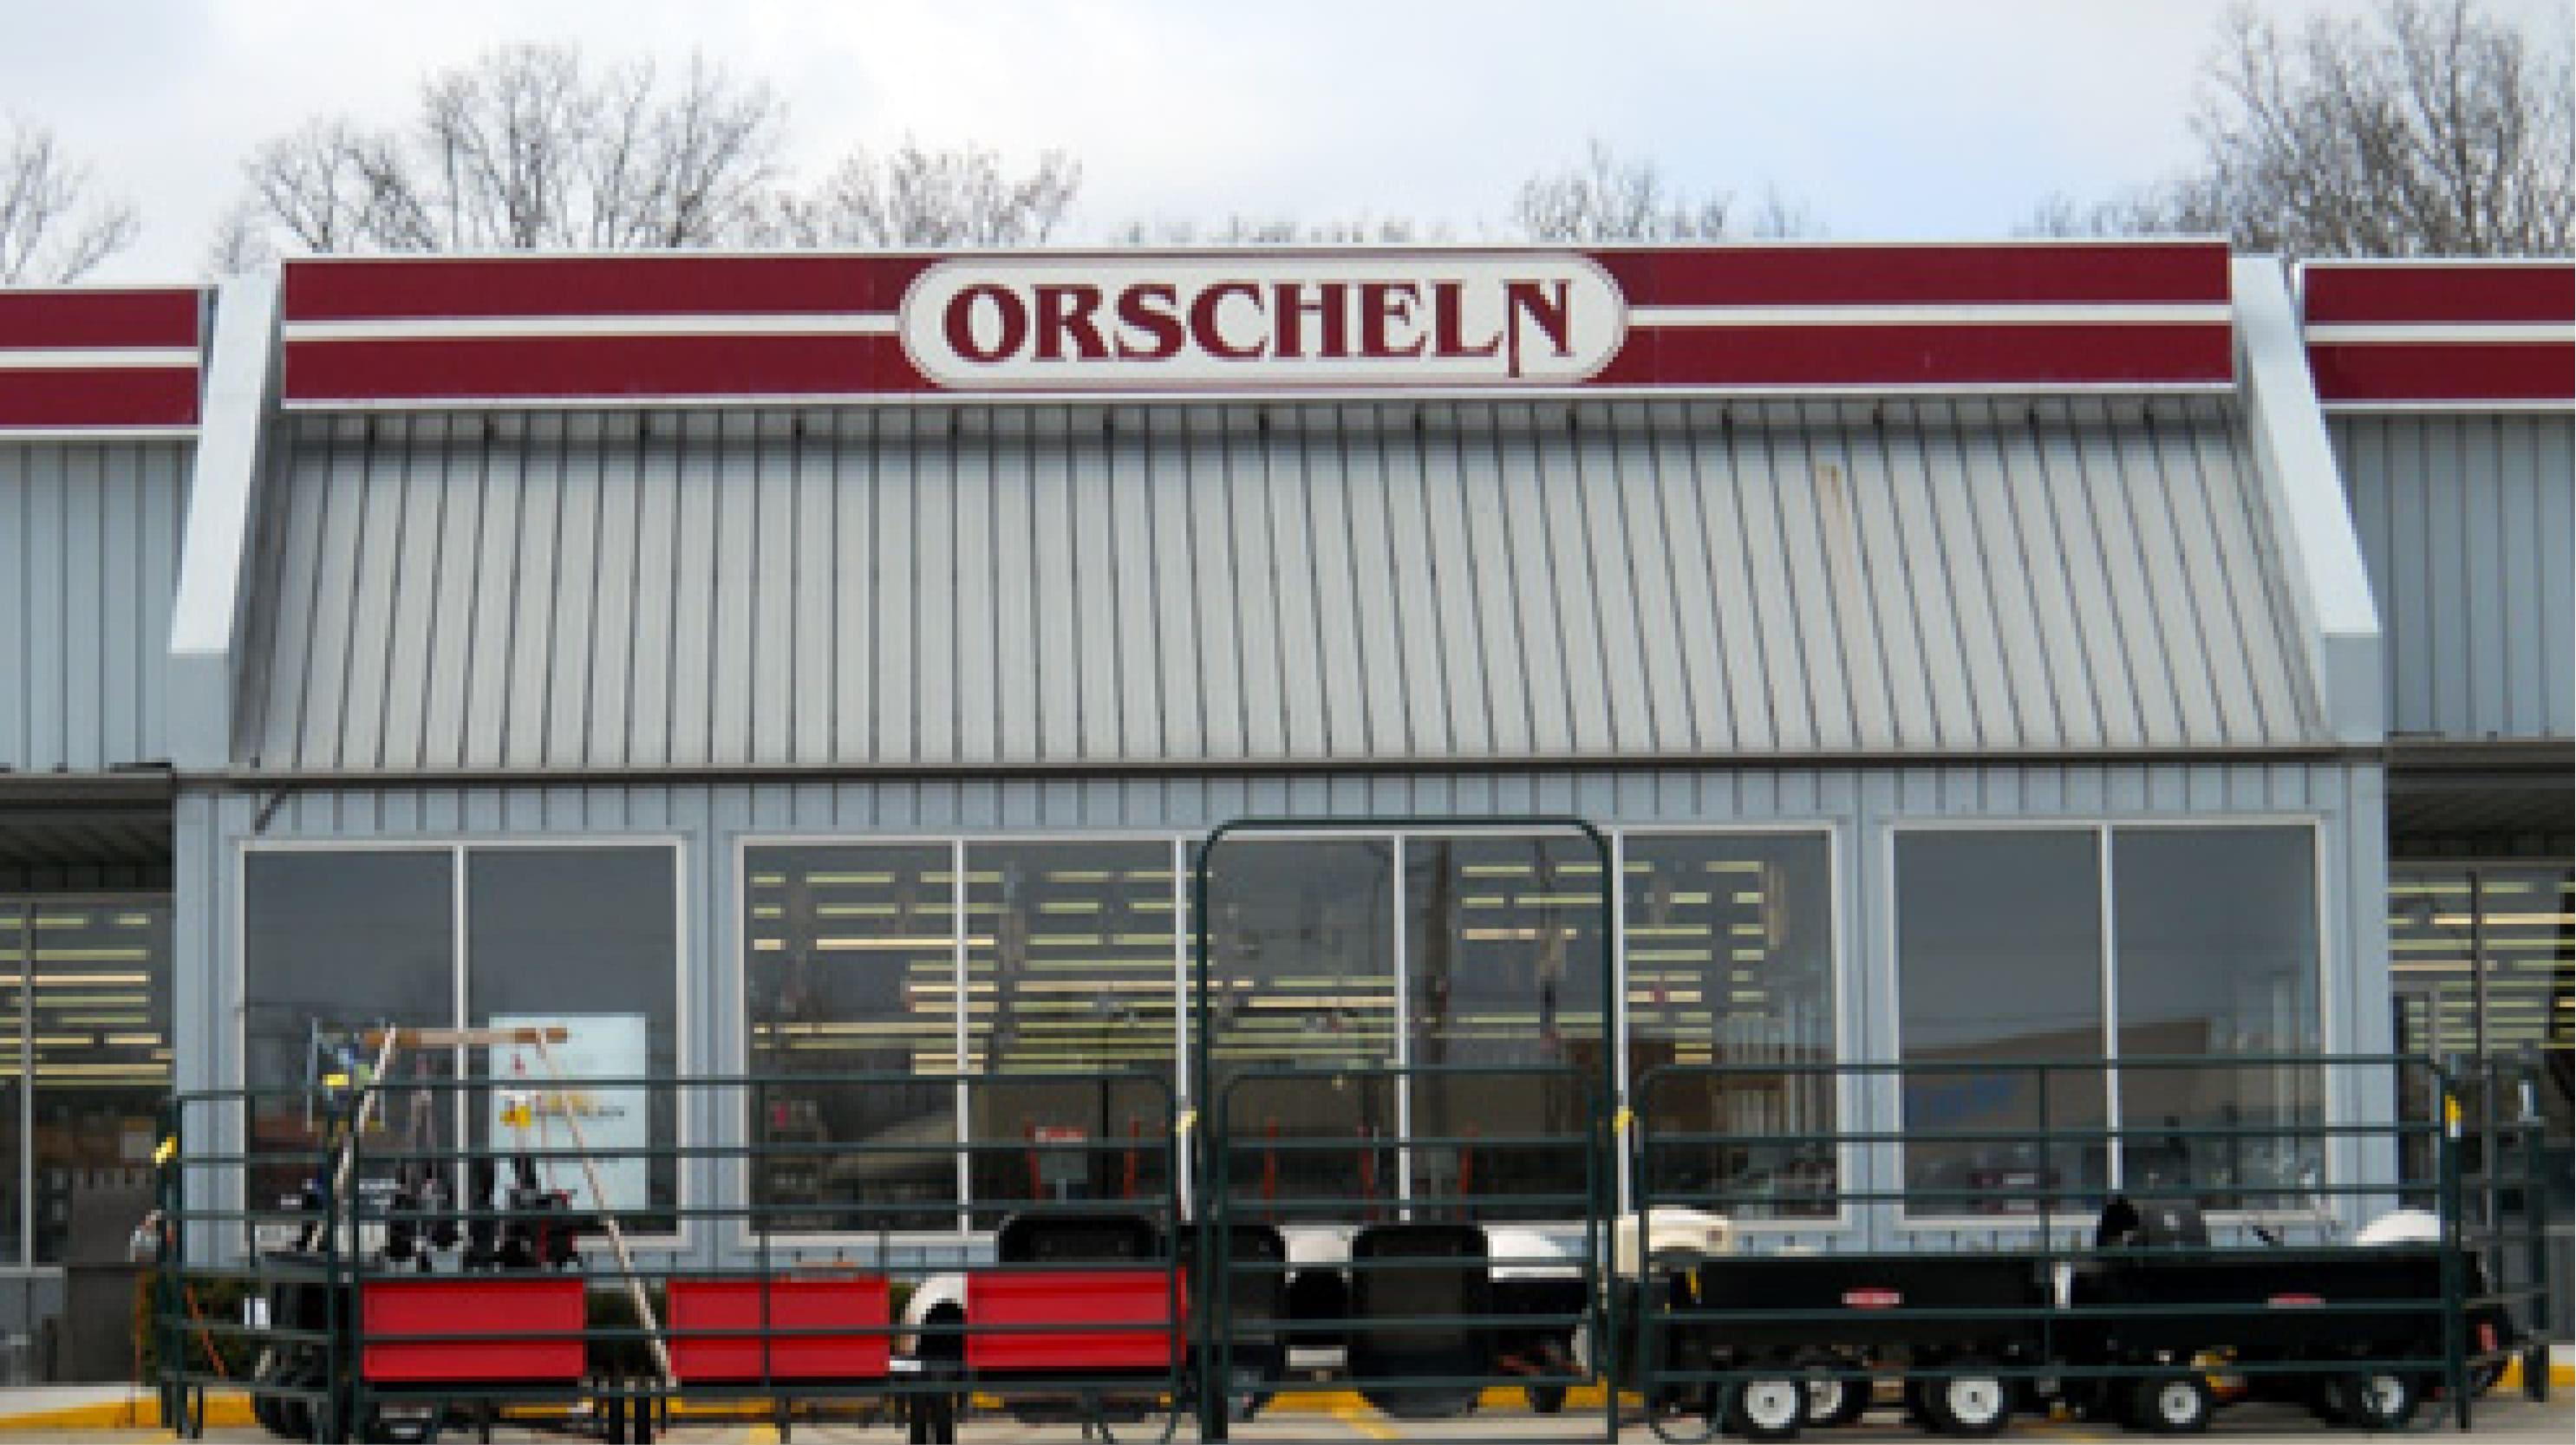 Front view of Orscheln Farm & Home Store in Eldon, Missouri 65026